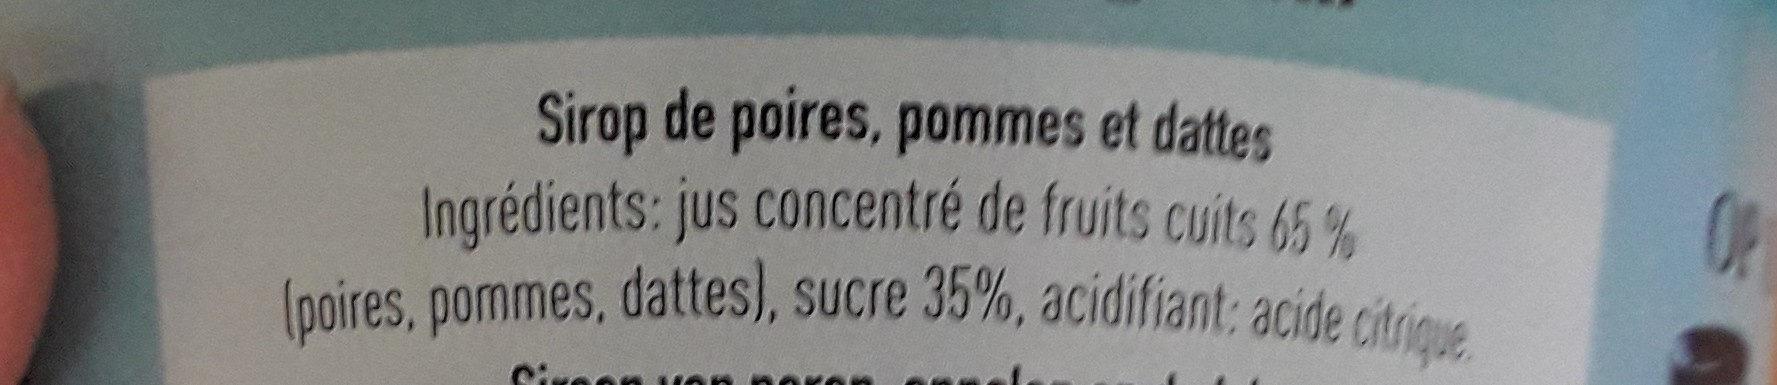 Du vrai sirop de Liège - 成分 - fr